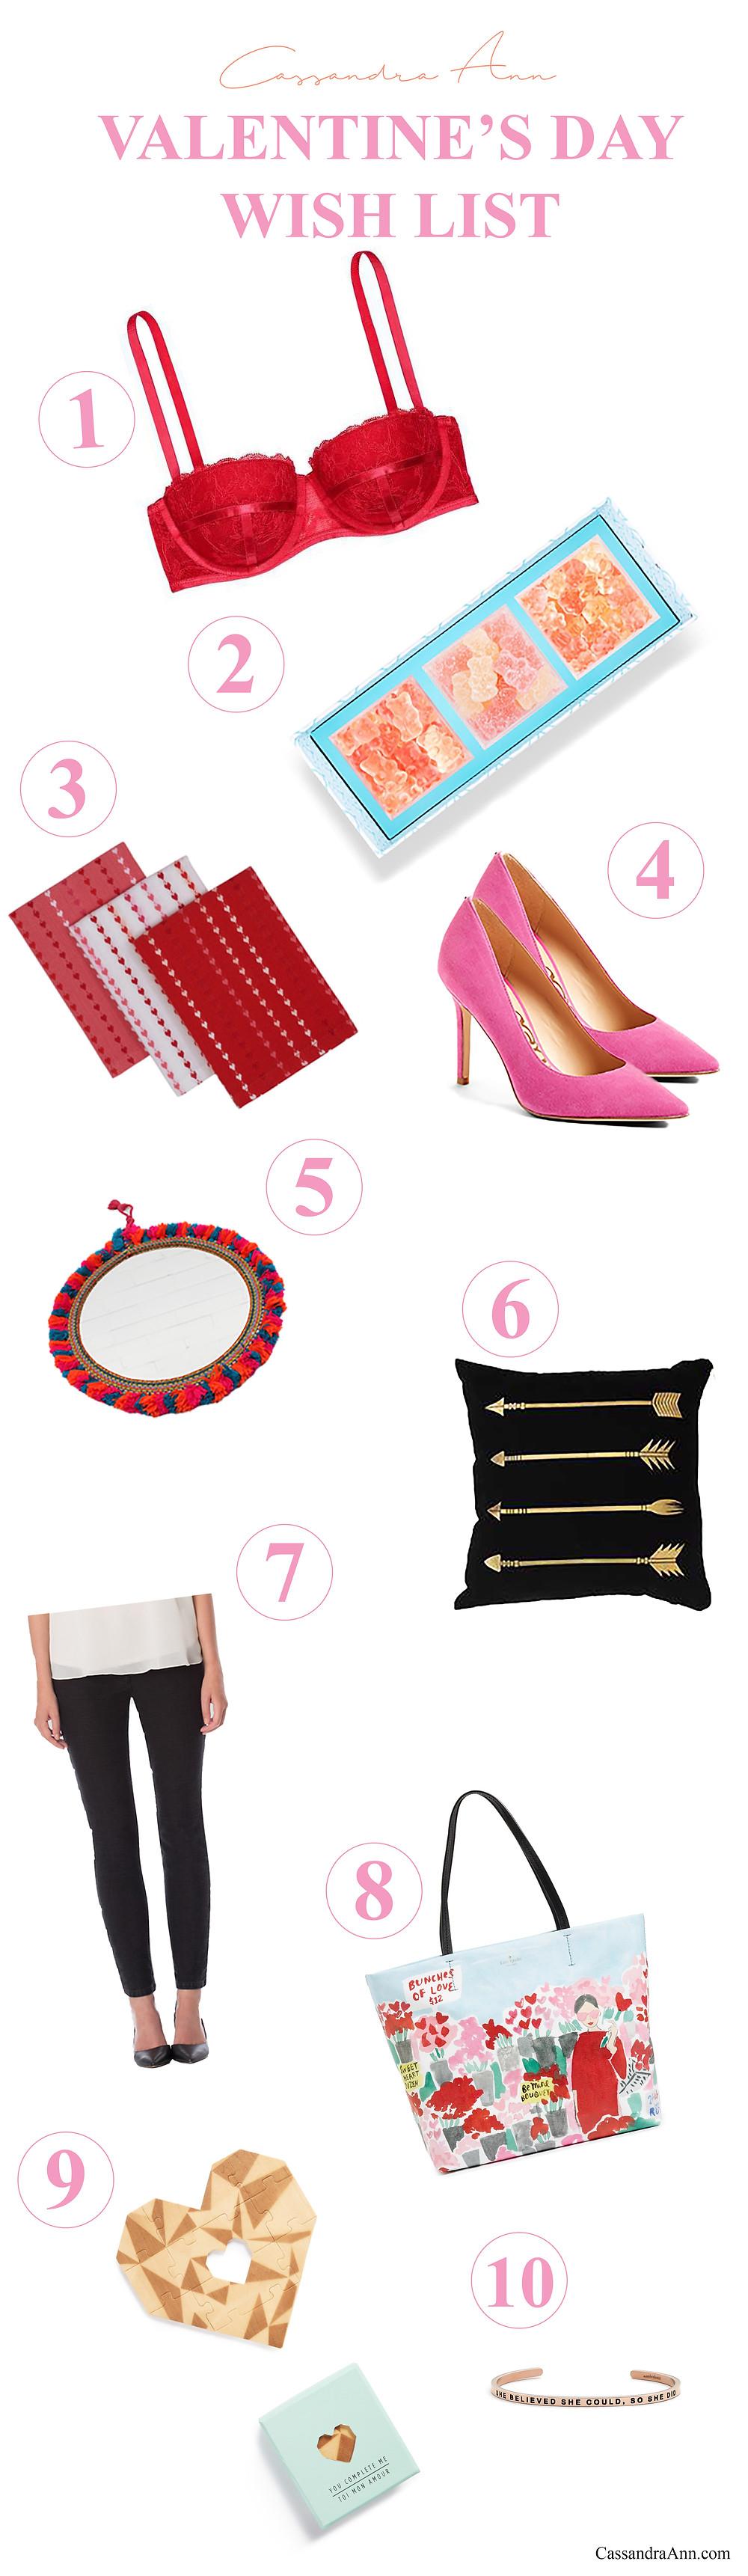 Cassandra Ann Lifestyle Blogger - Valentine's Day Wish List - Fashion Blogger - Fashion Blog - Beauty Blog - Top Blogger 2017